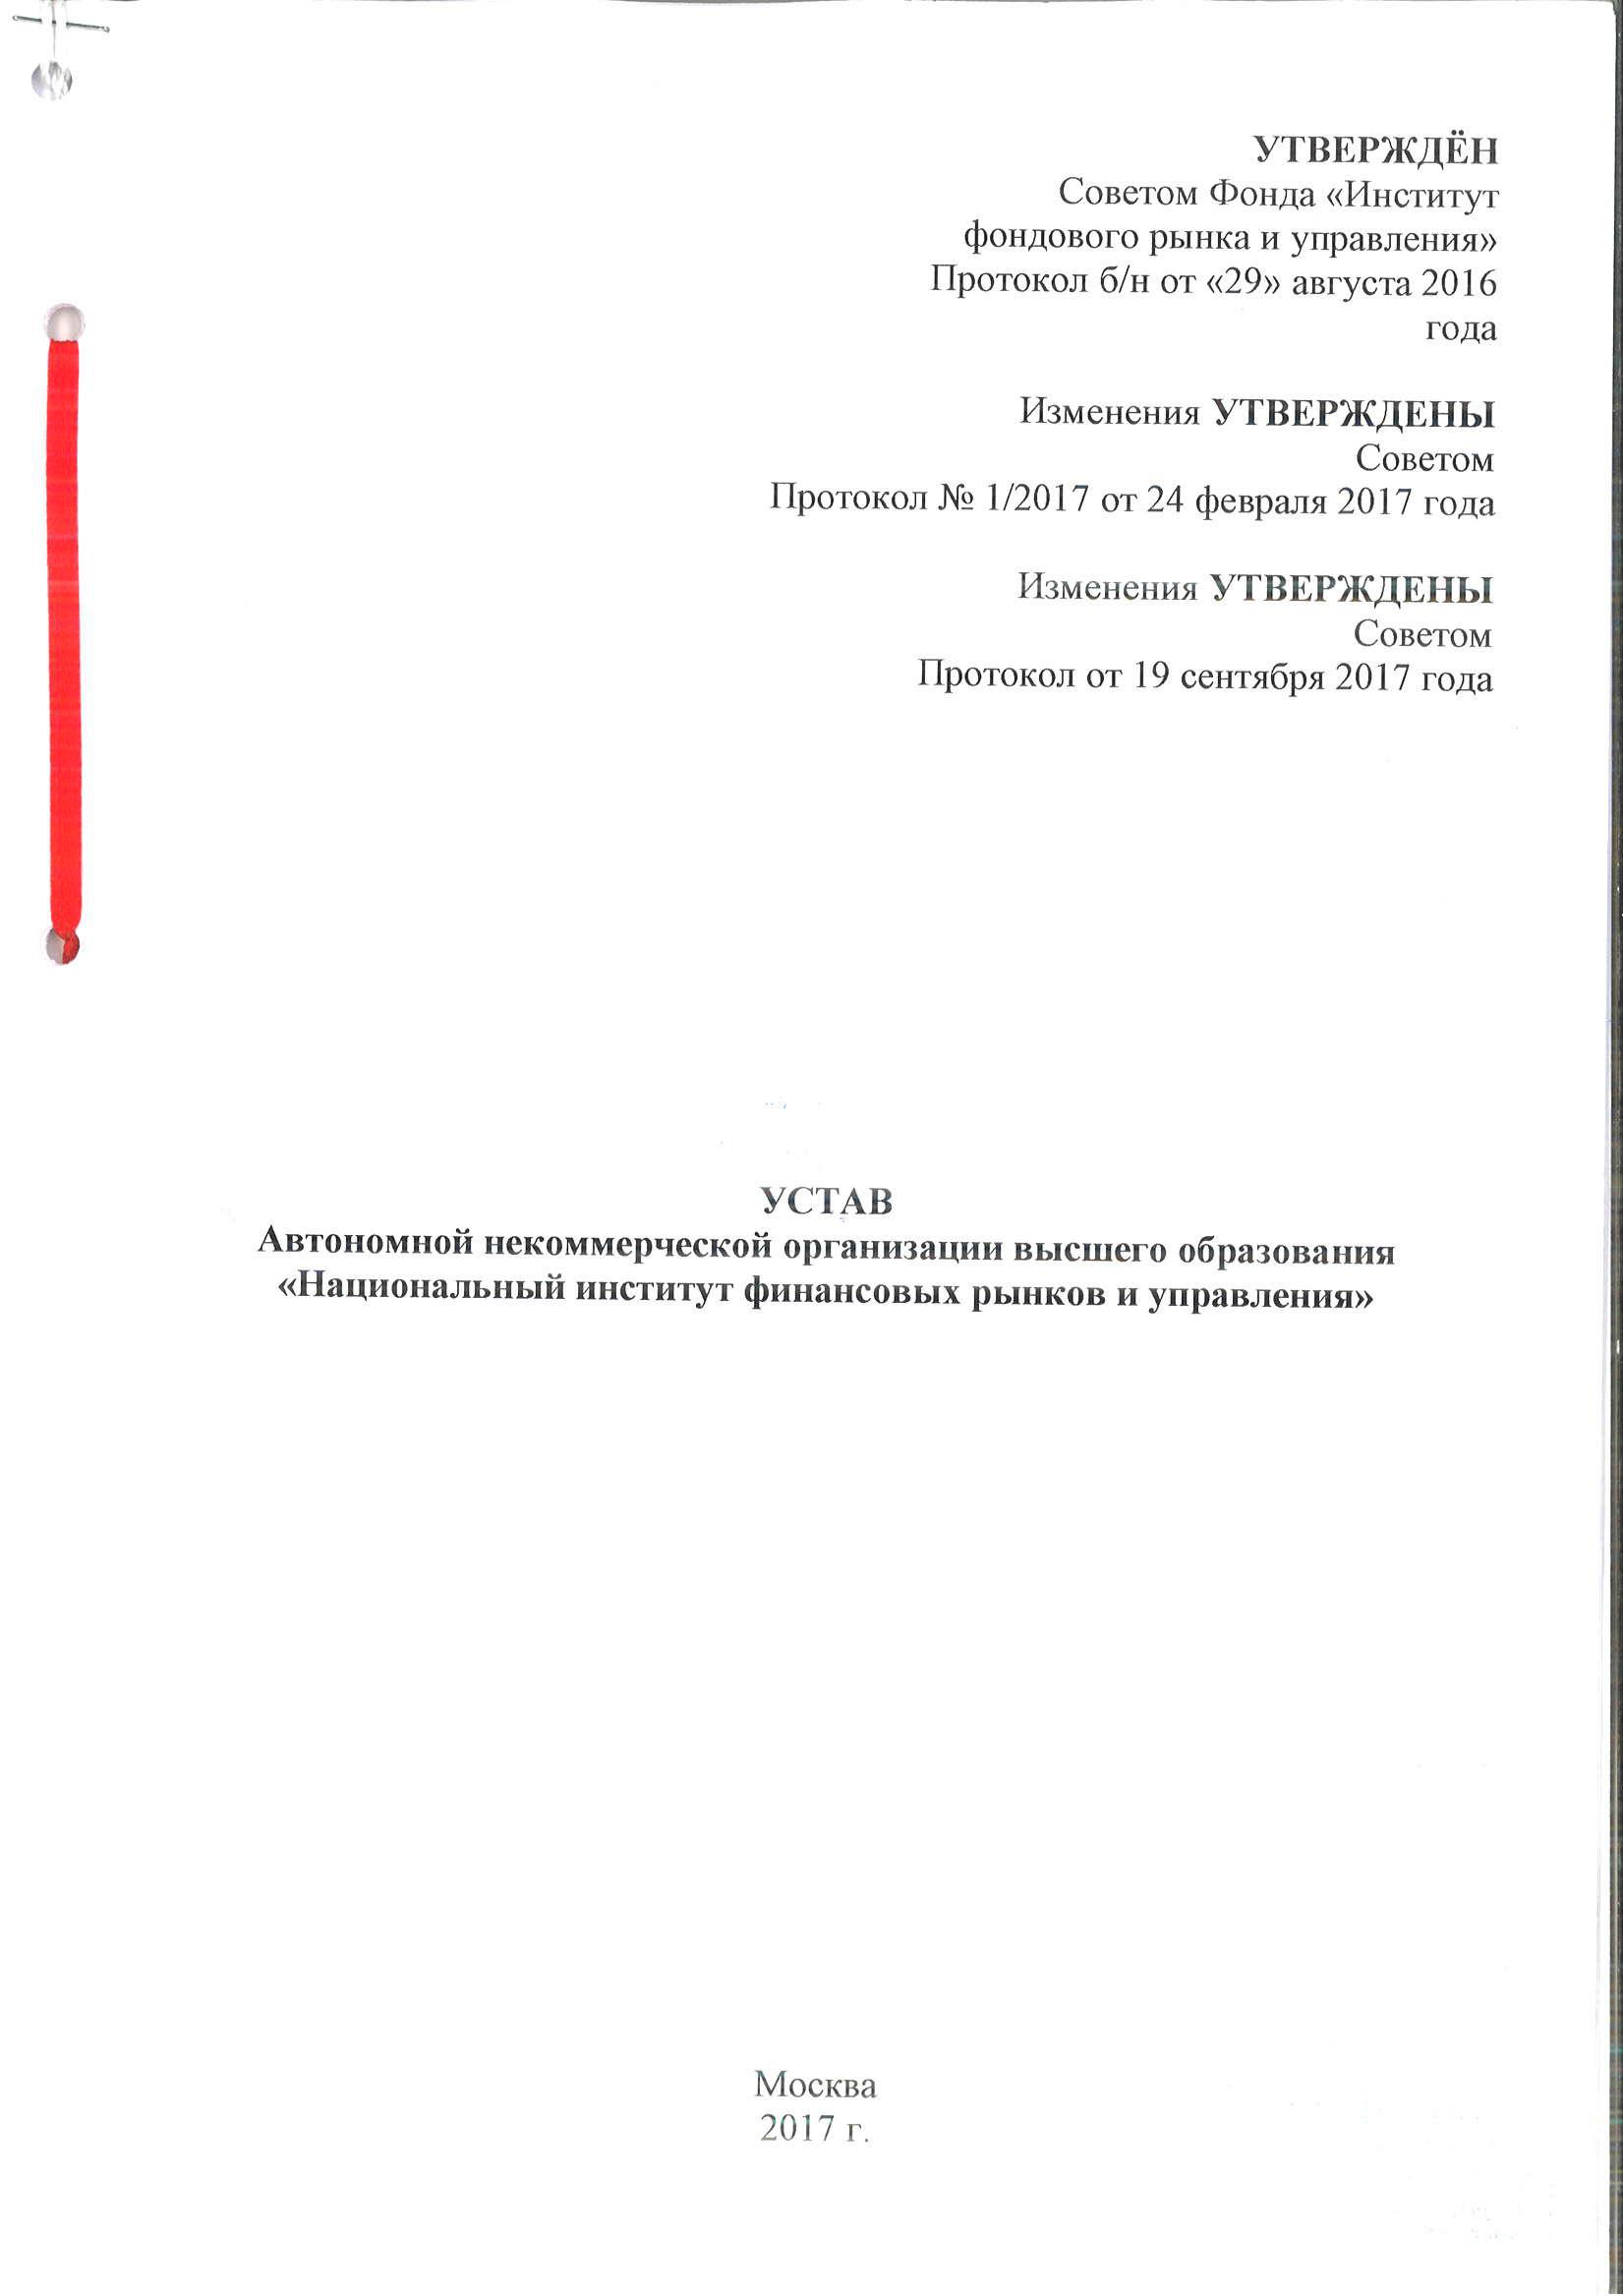 Ustav_NIFRU_19.09.17.png